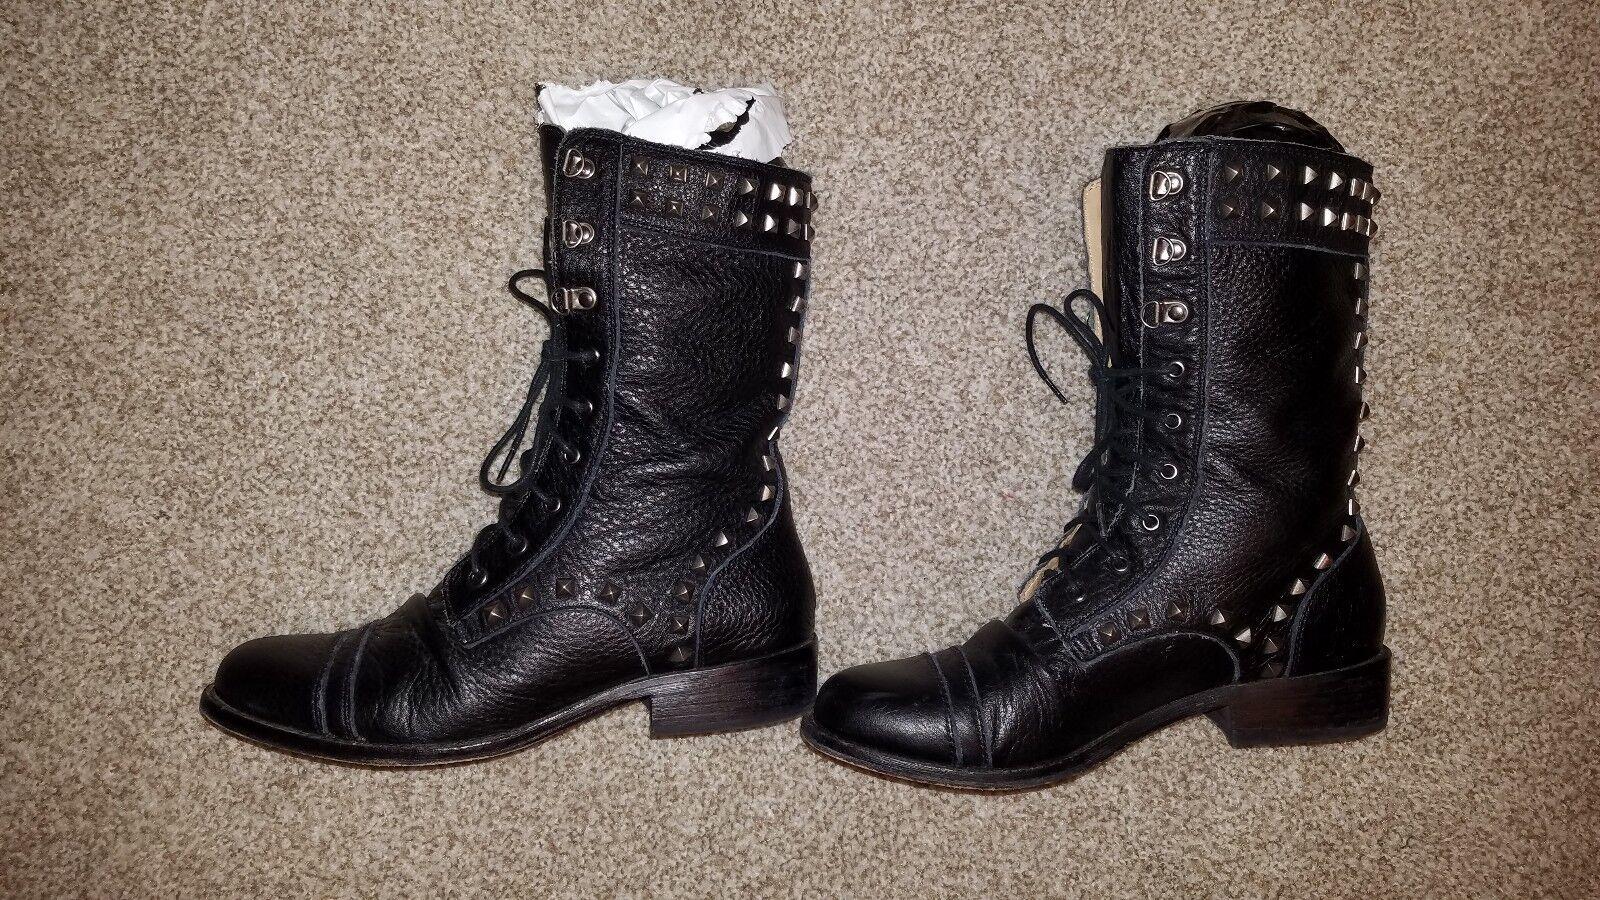 Juicy Couture Chara Tachonado Mitad de Pantorrilla botas, pre-owned Sz Sz Sz 8 Orig  350 896990